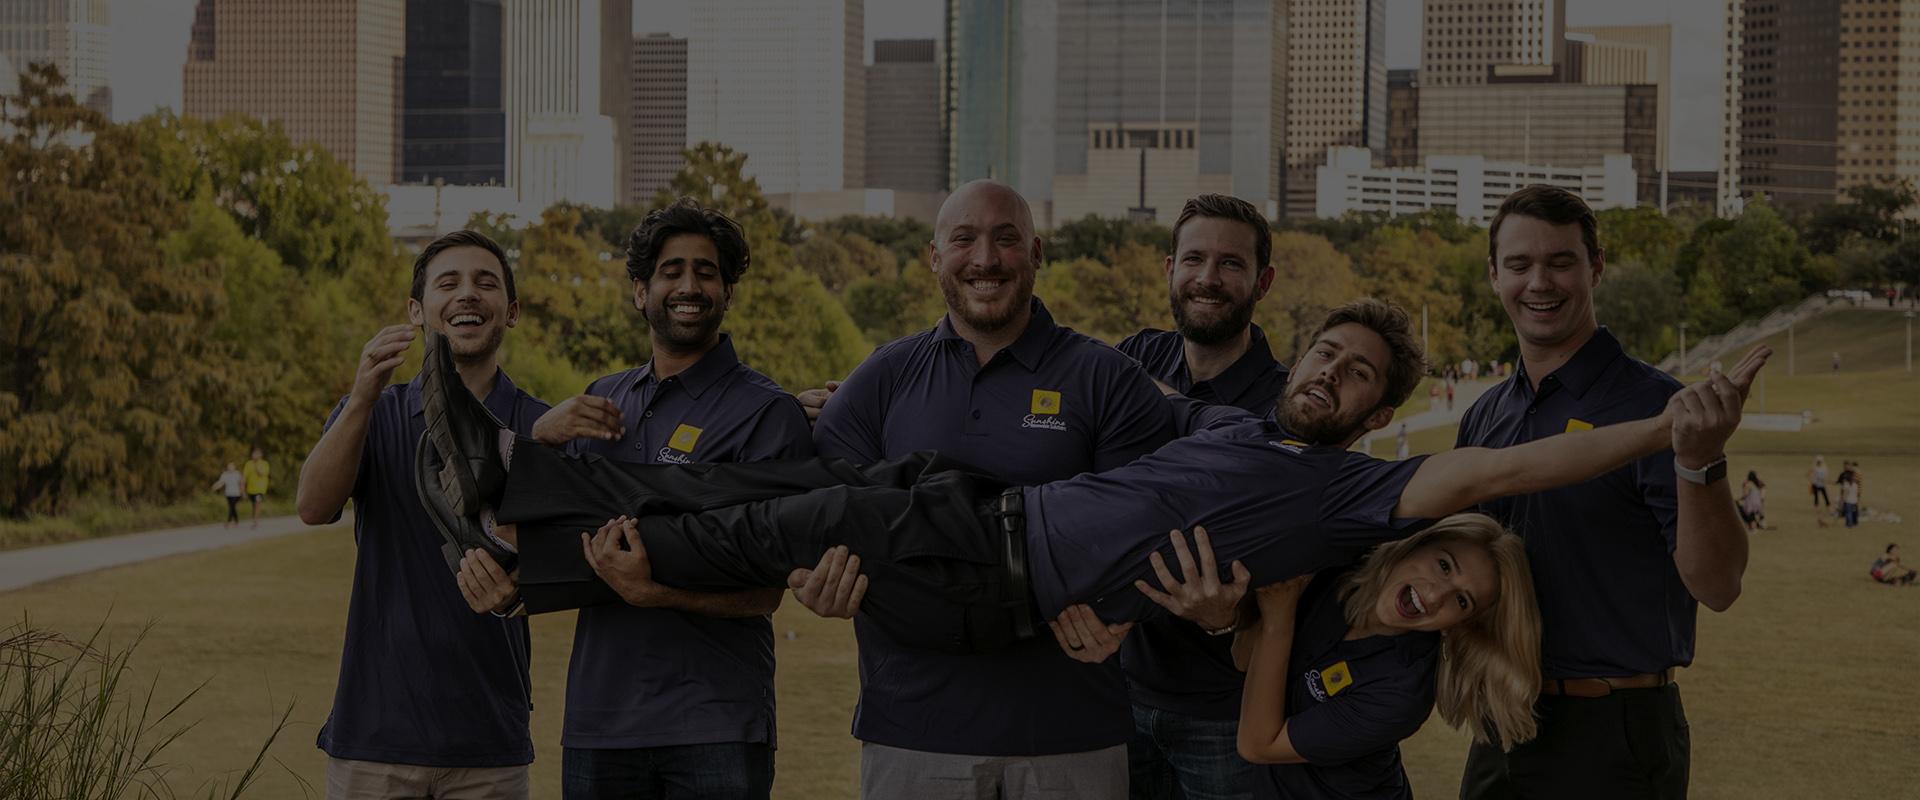 Sunshine Renewable Solutions Team Photo